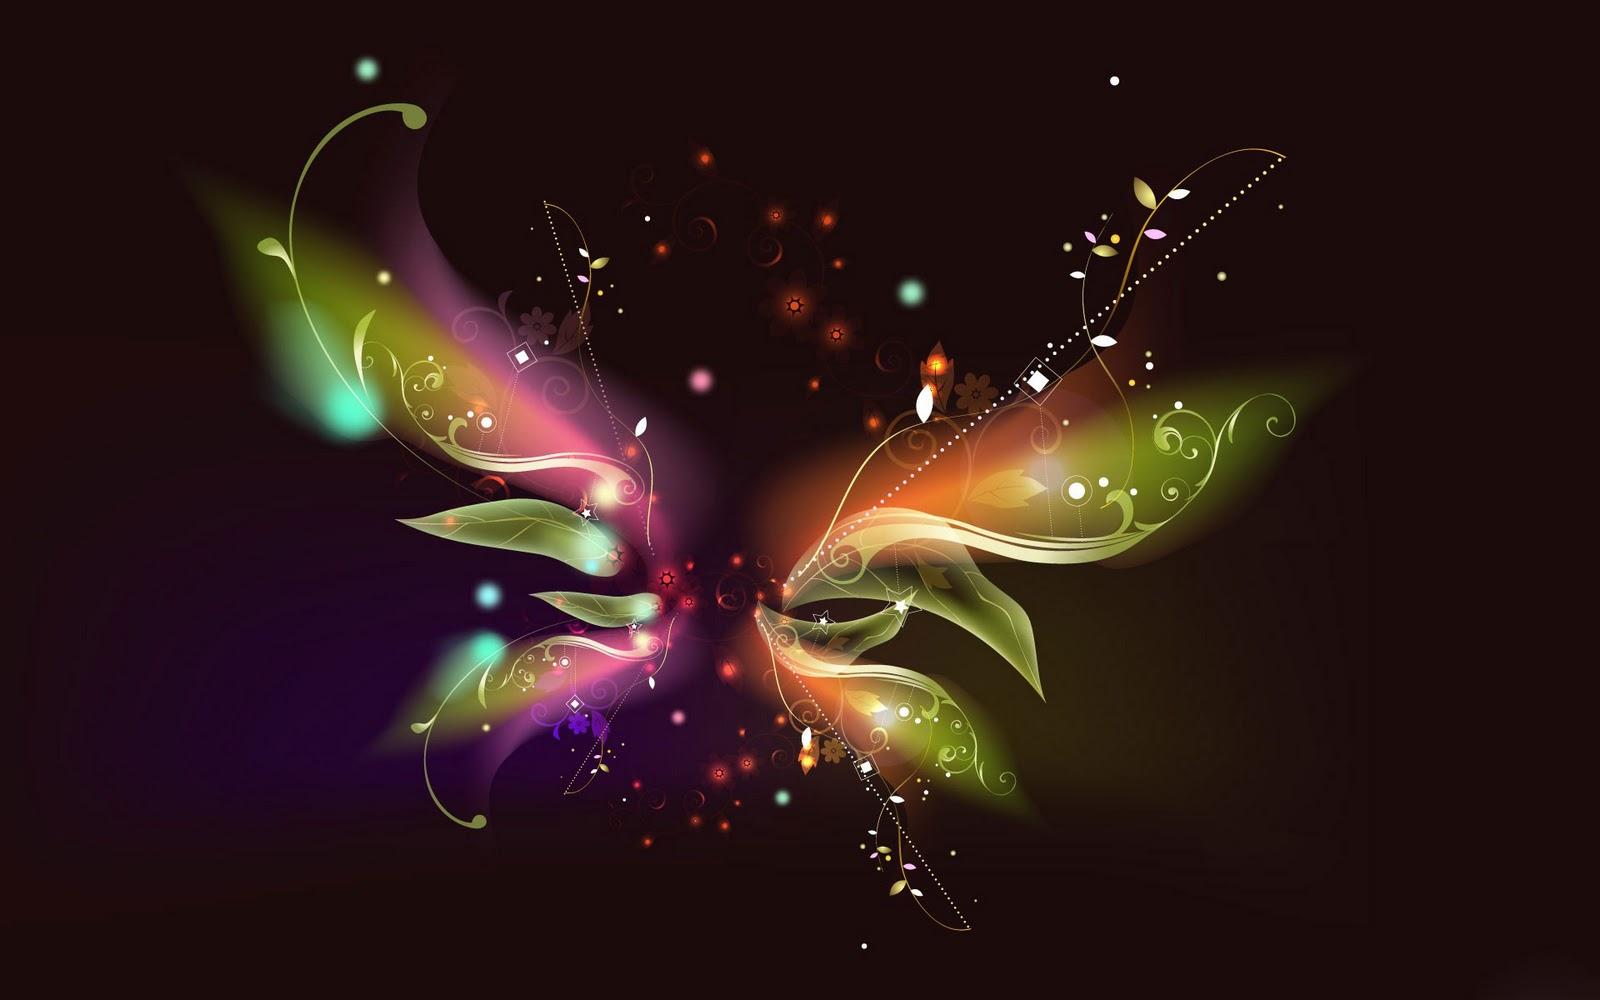 http://1.bp.blogspot.com/-ZnoW_Xk9v3Y/TrAf49uf-hI/AAAAAAAACI0/dfp_kS_C53A/s1600/butterfly-desktop-wallpaper-4.jpg